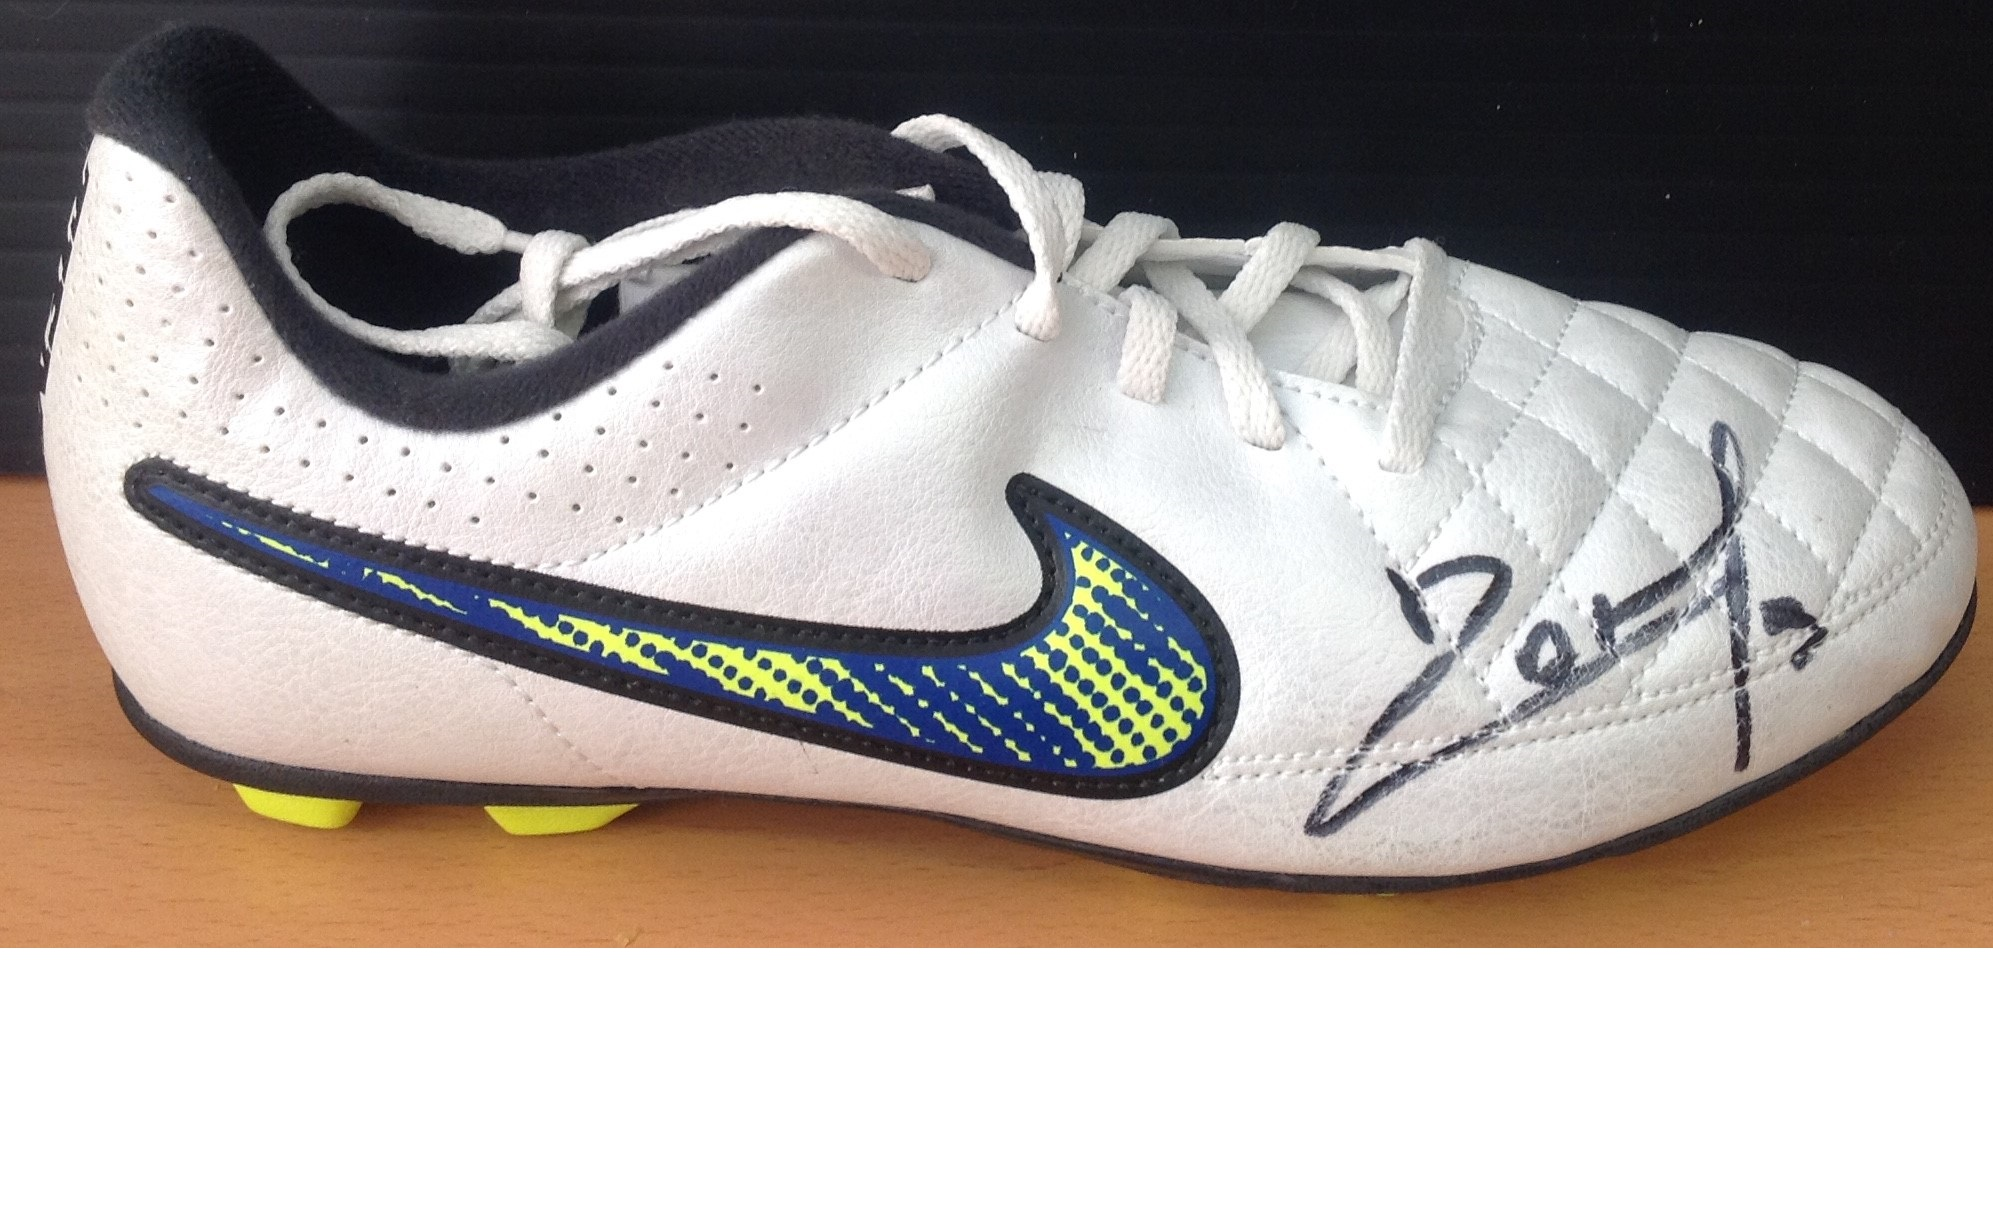 Lot 33 - Football Pablo Zabaleta signed Nike football boot. Pablo Javier Zabaleta Girod is an Argentine